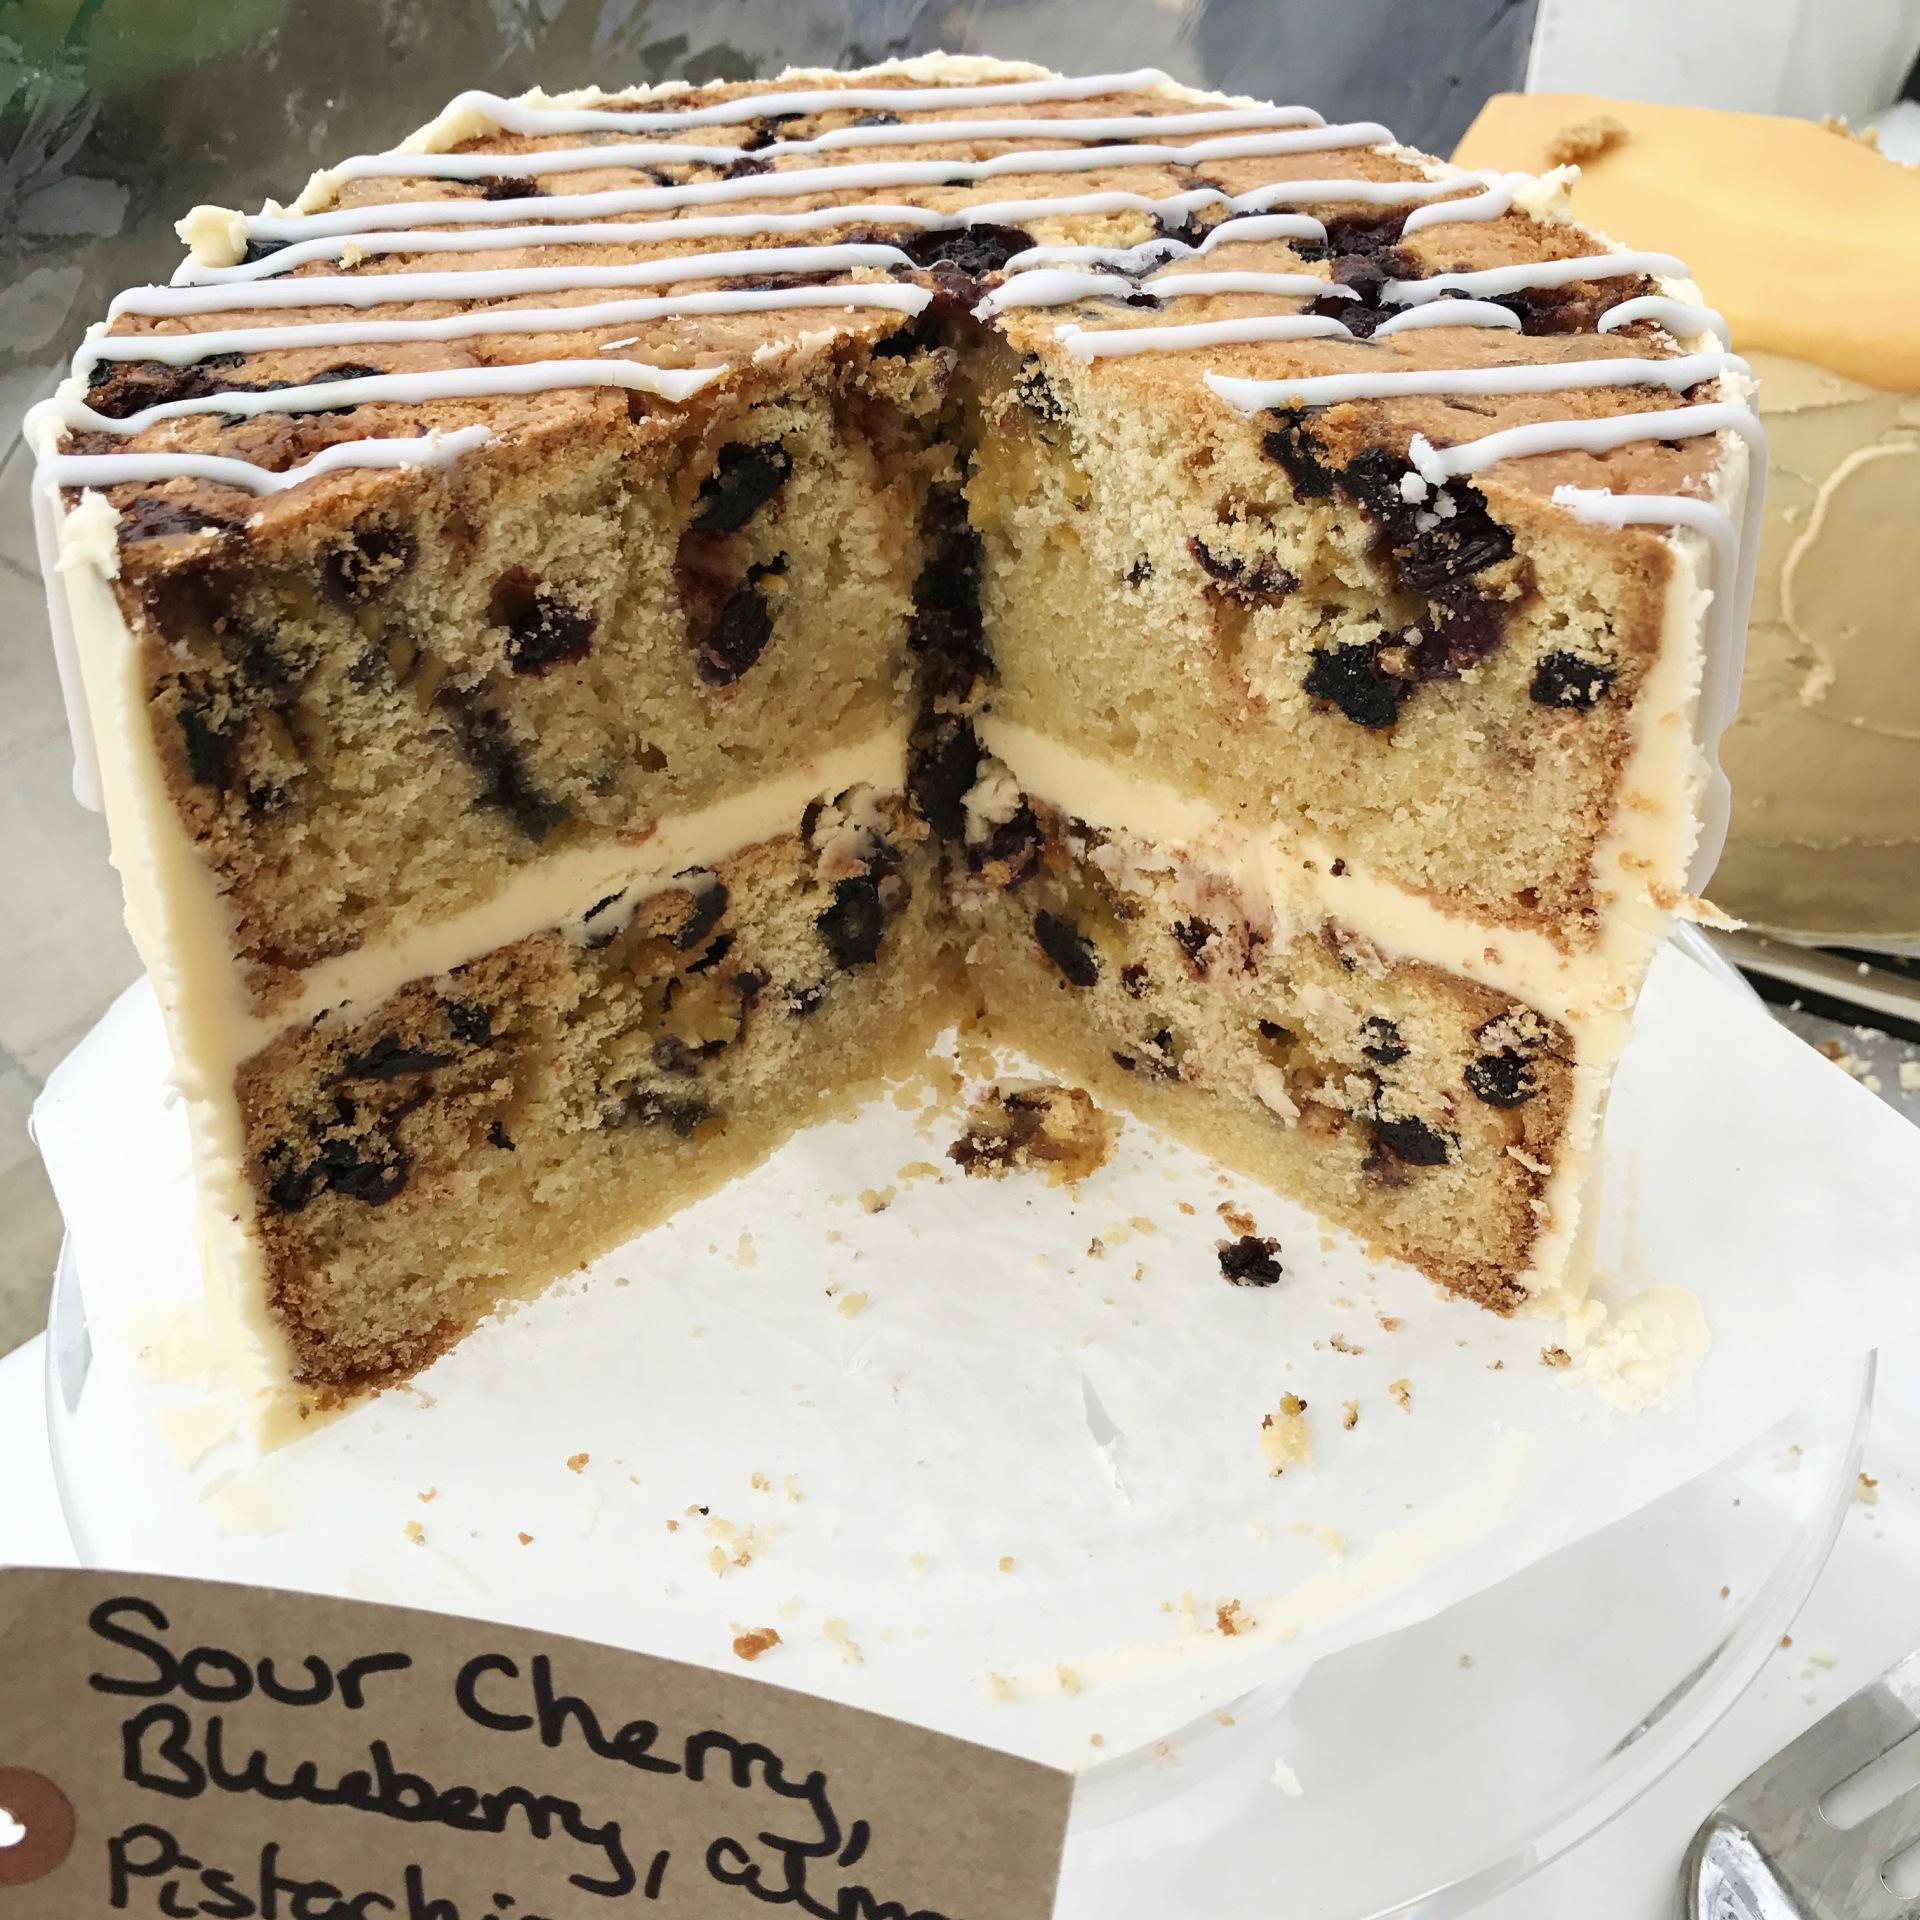 Sour Cherry, Blueberry, Pistachio, Almond and Orange Blossom Roll Cake